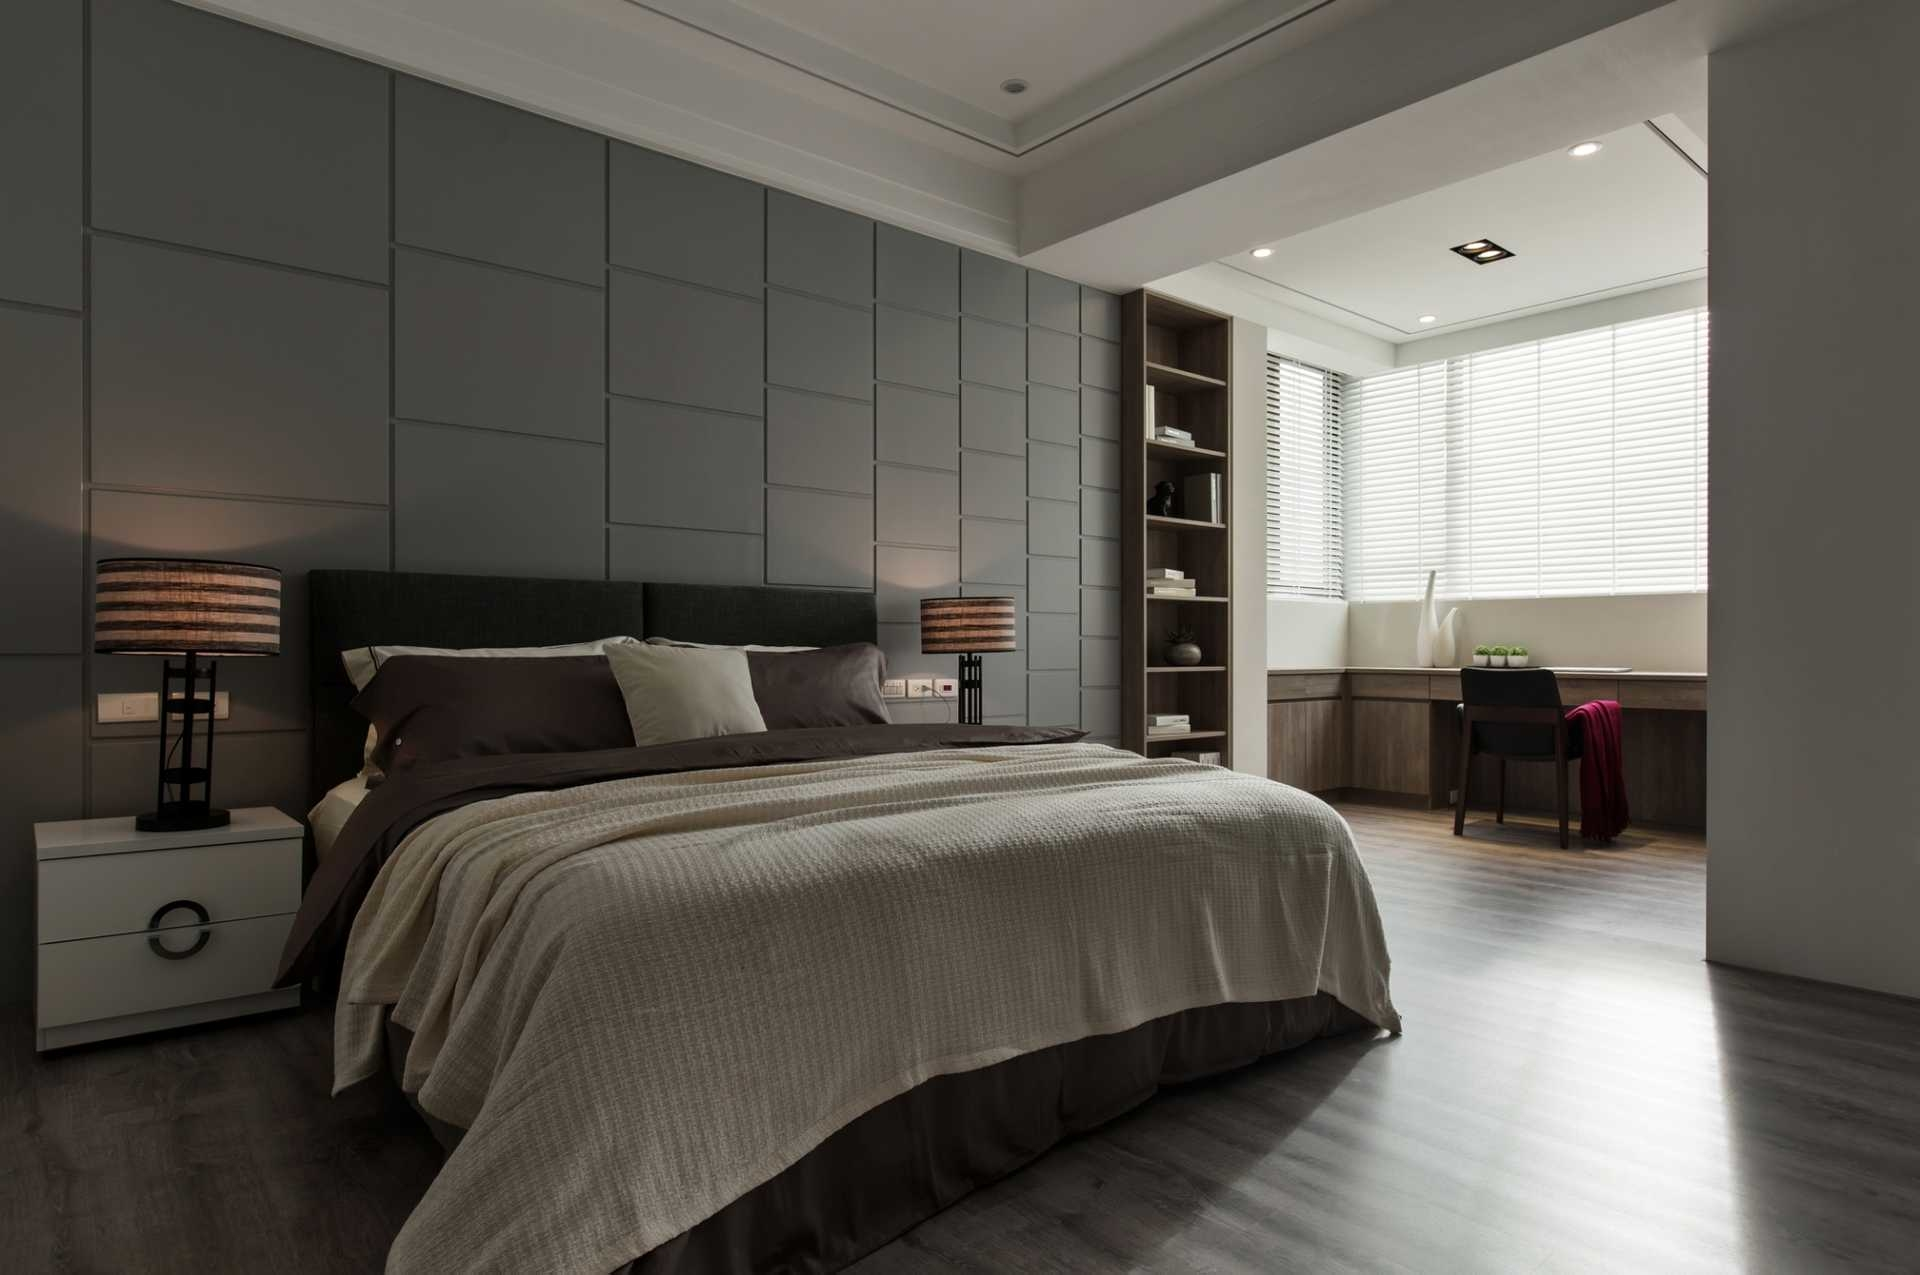 Bedroom,Classical